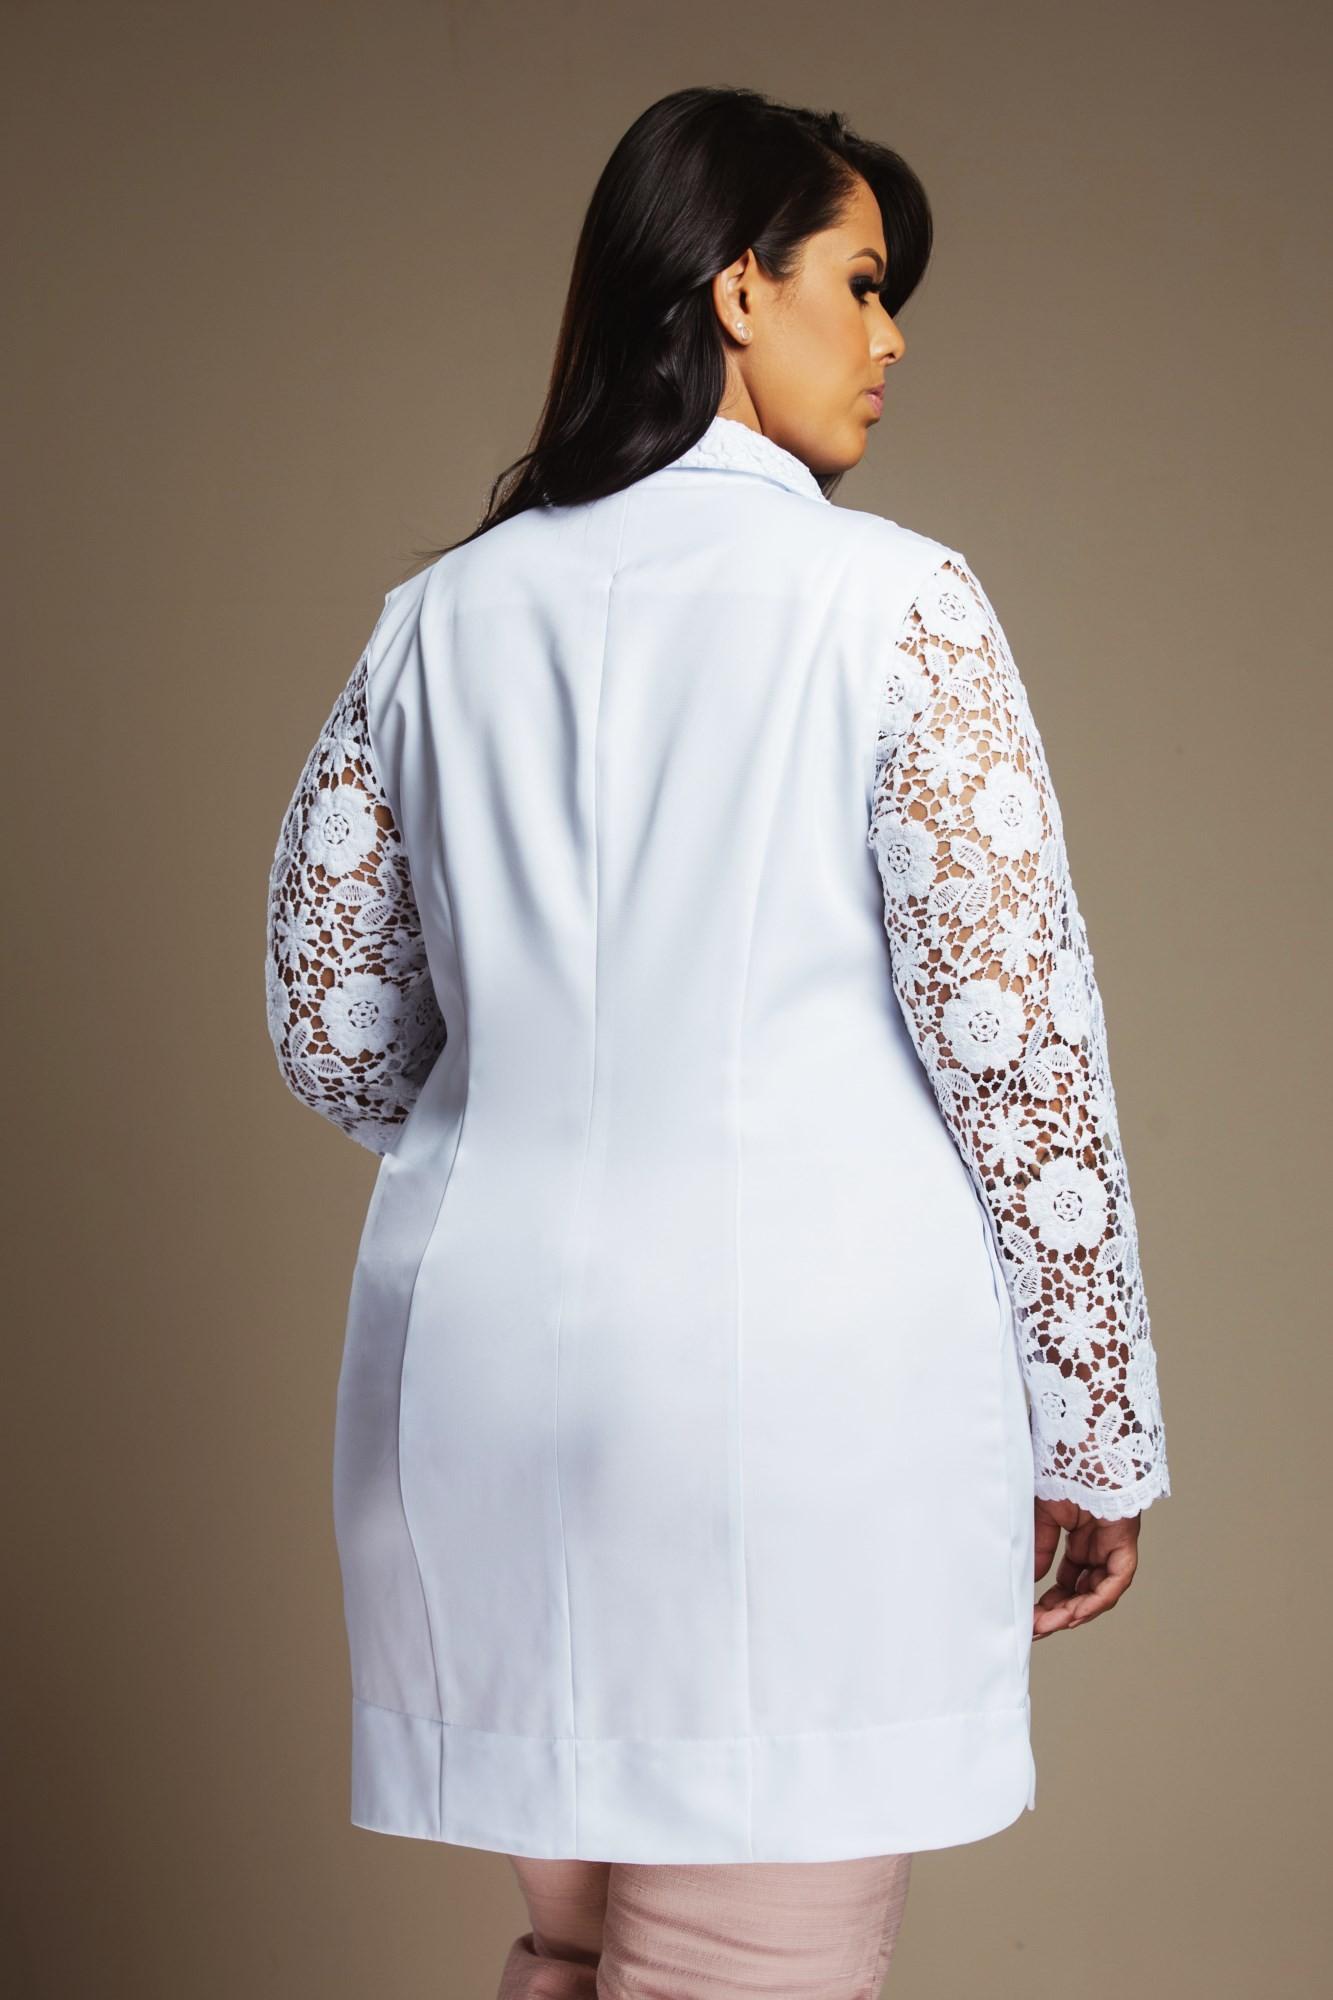 Jaleco Feminino Plus Size com Renda Zely Floral